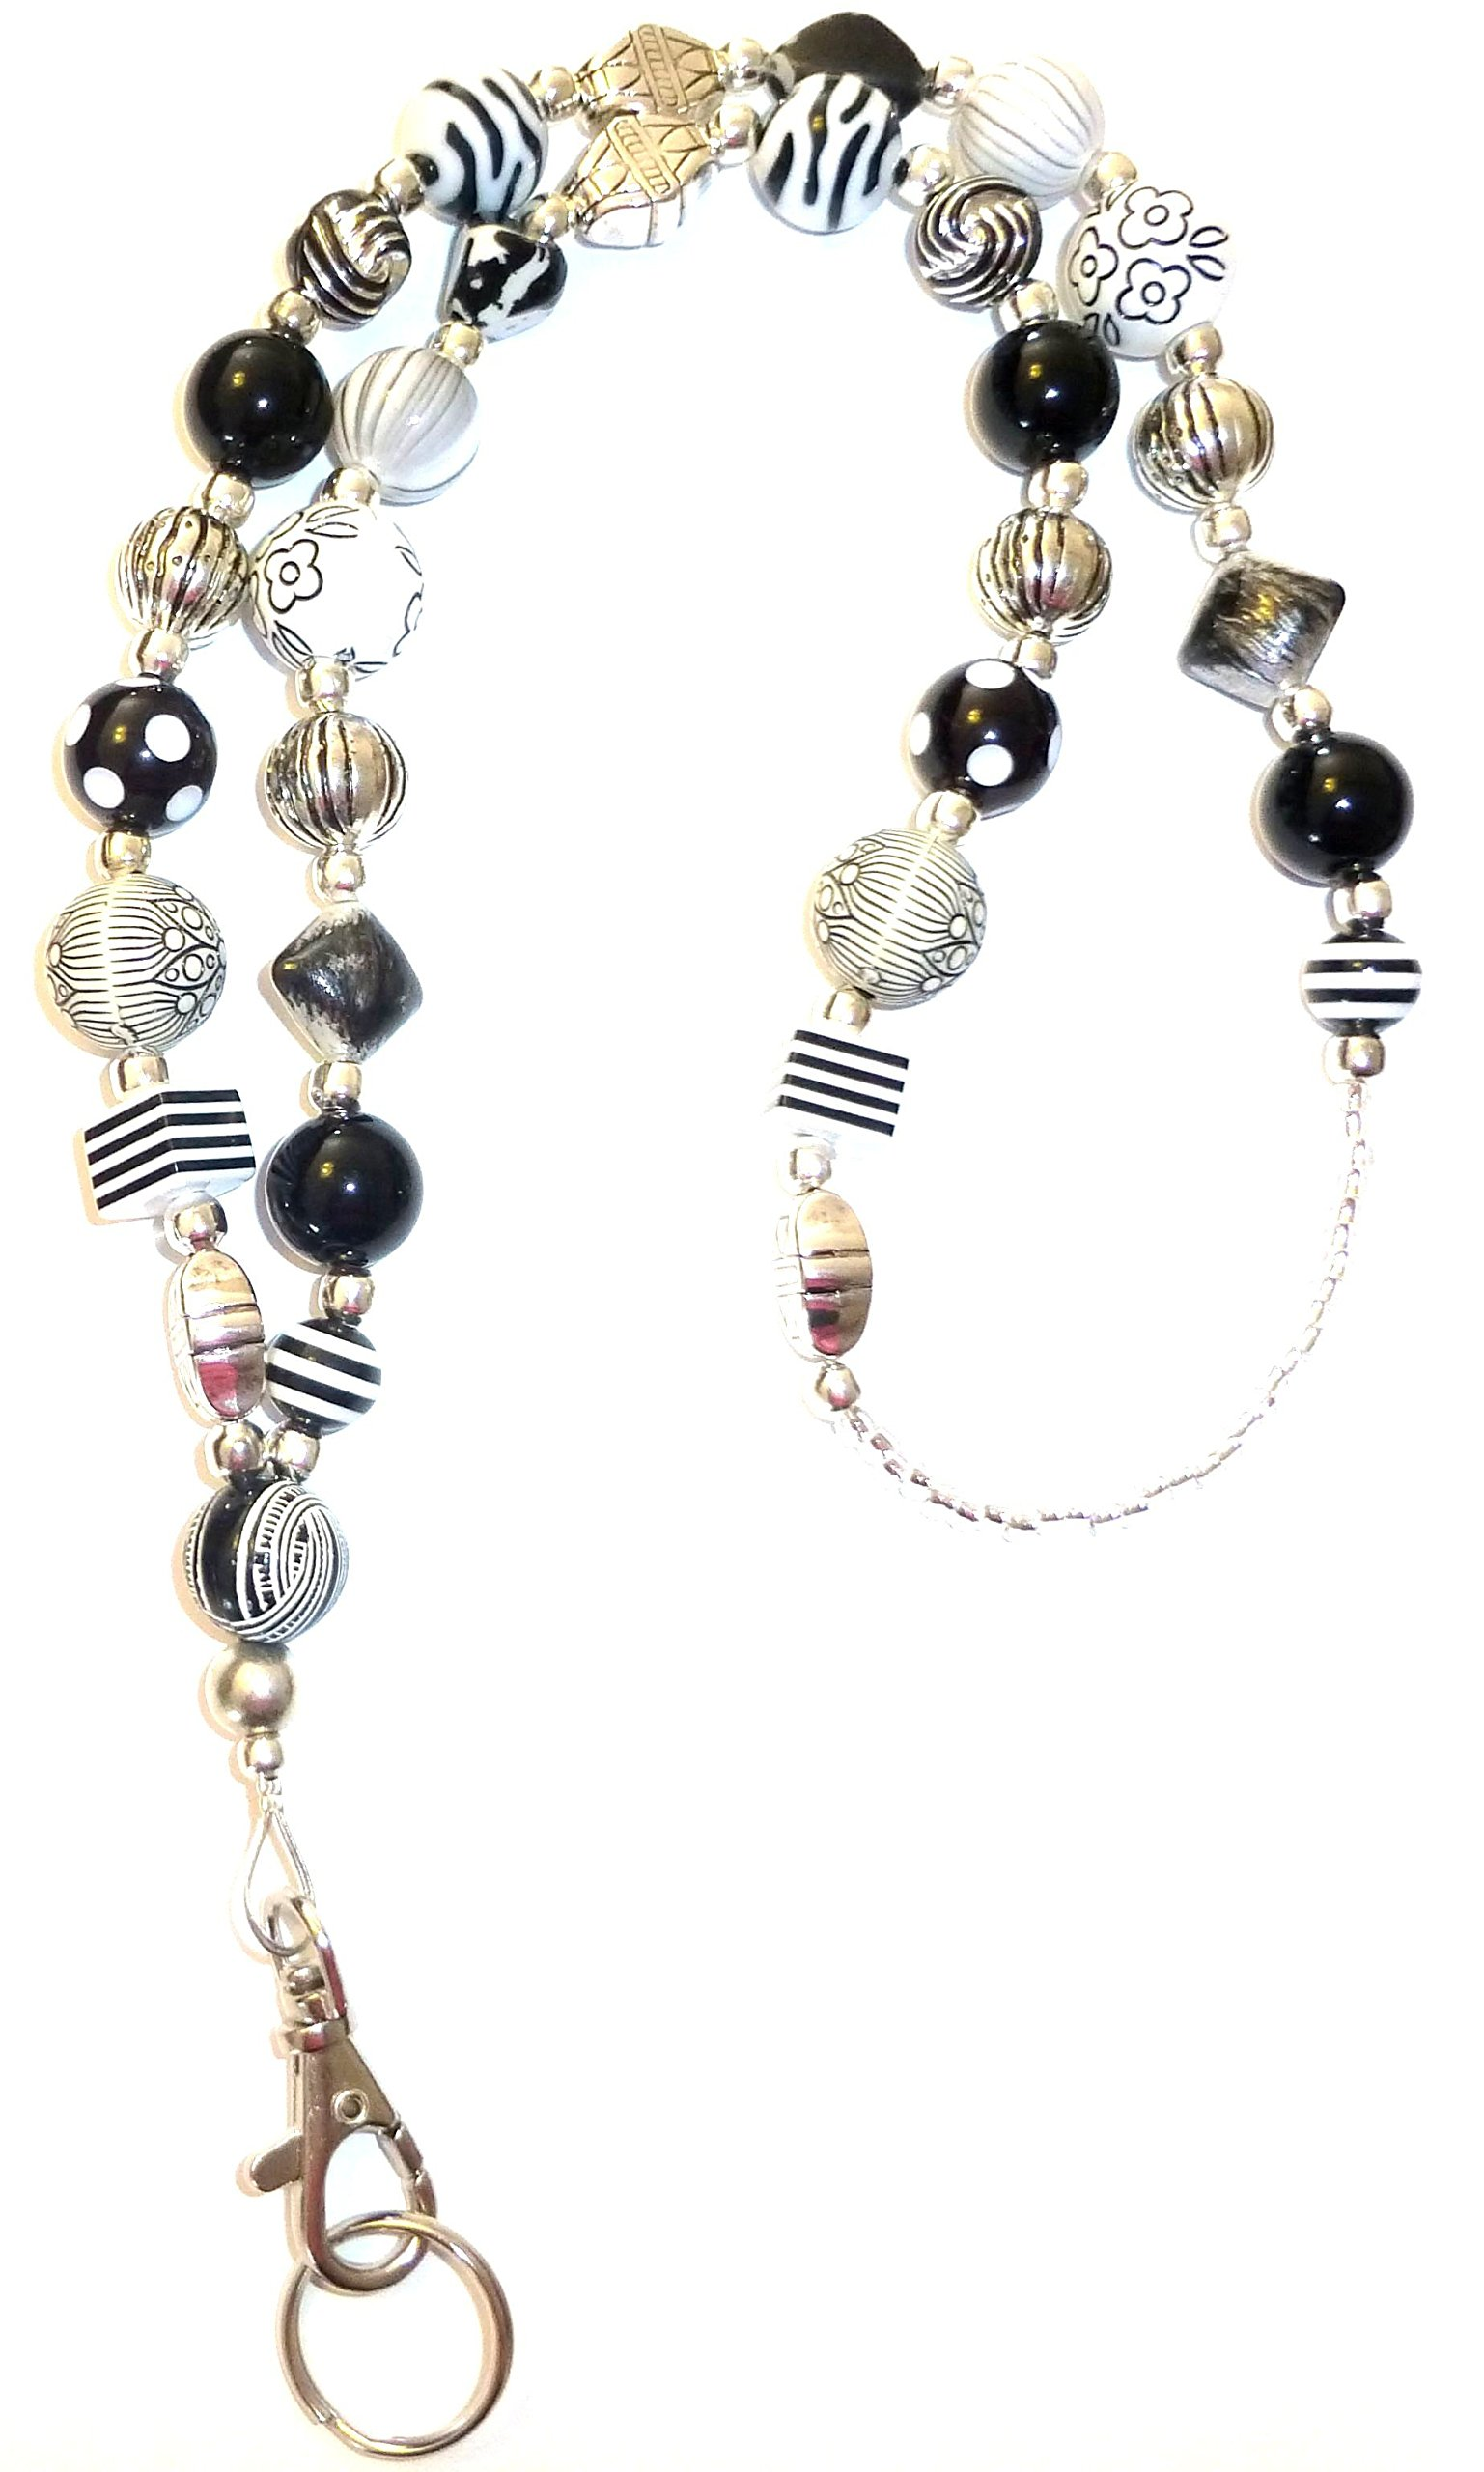 Hidden Hollow Beads   Women's Fashion Lanyard and Badge holder 34'' Lanyard    (Chunky Black and White Non Breakaway)